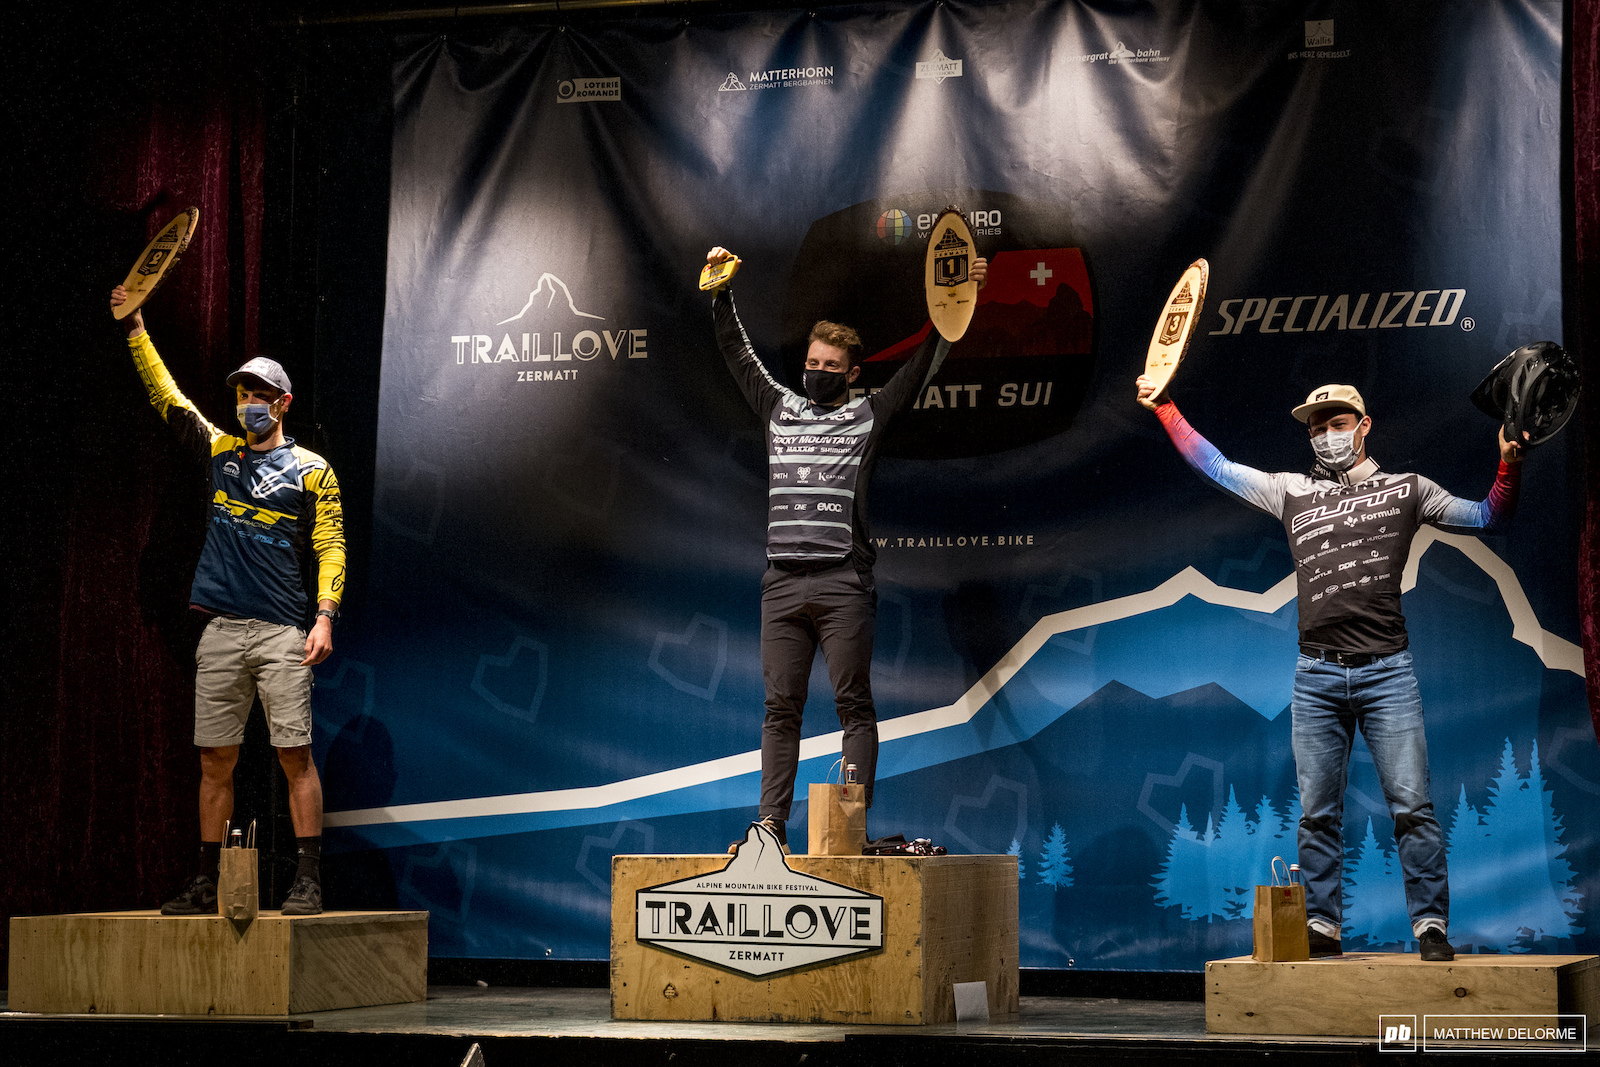 Jesse Melamed Martin Maes and Theo Gally. Pro Men s podium.